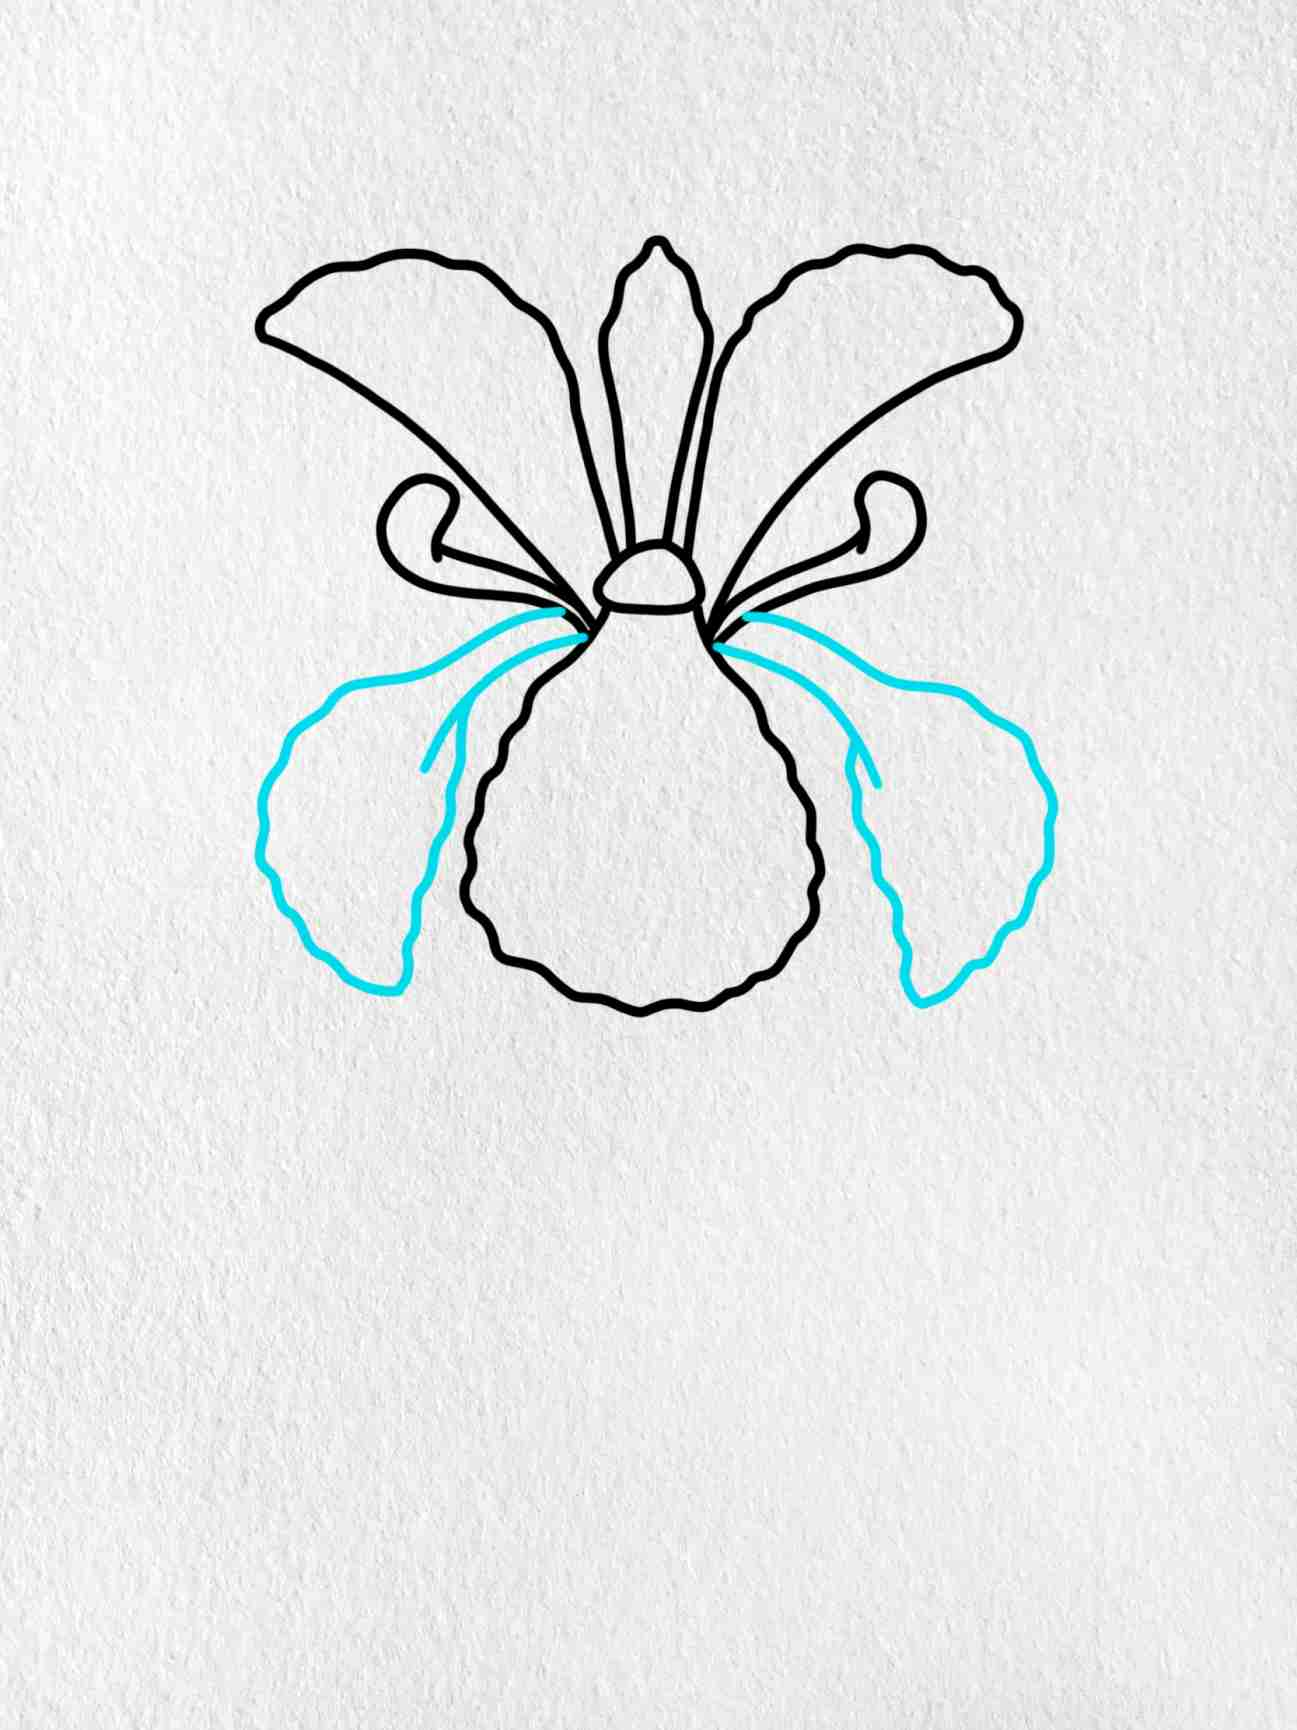 How To Draw An Iris Flower: Step 4